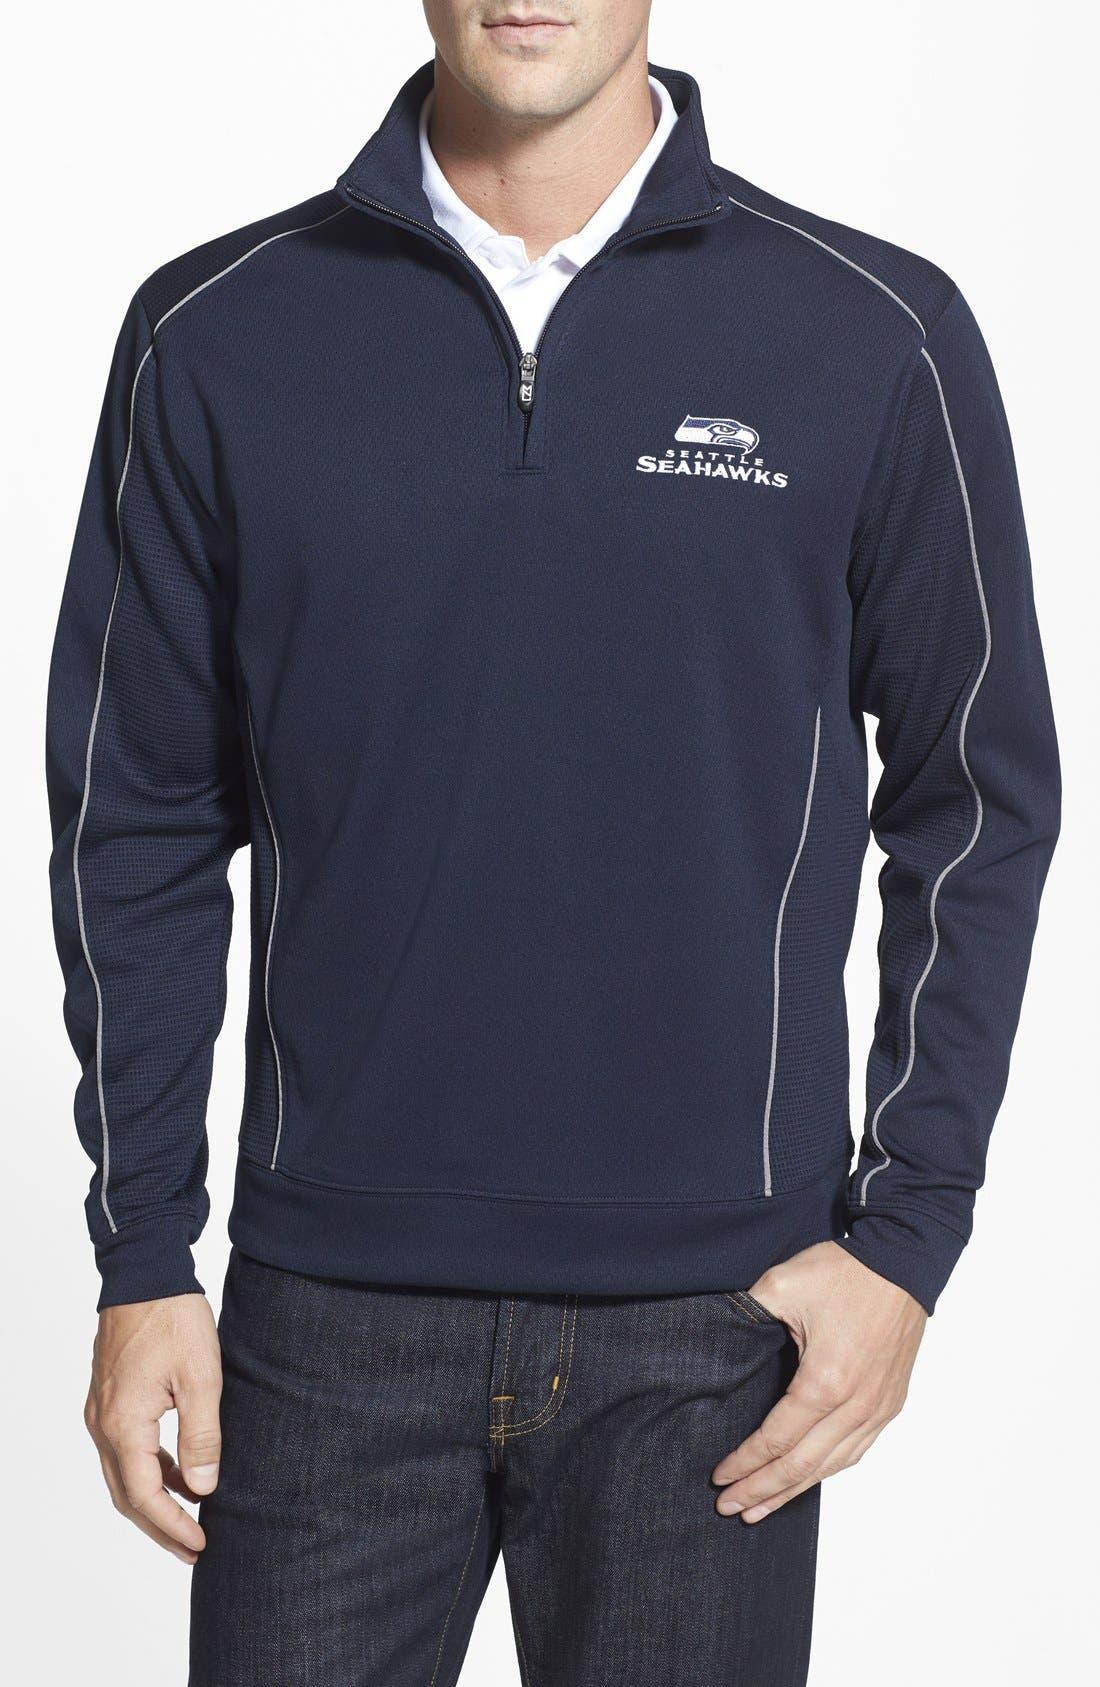 Main Image - Cutter & Buck Seattle Seahawks - Edge DryTec Moisture Wicking Half Zip Pullover